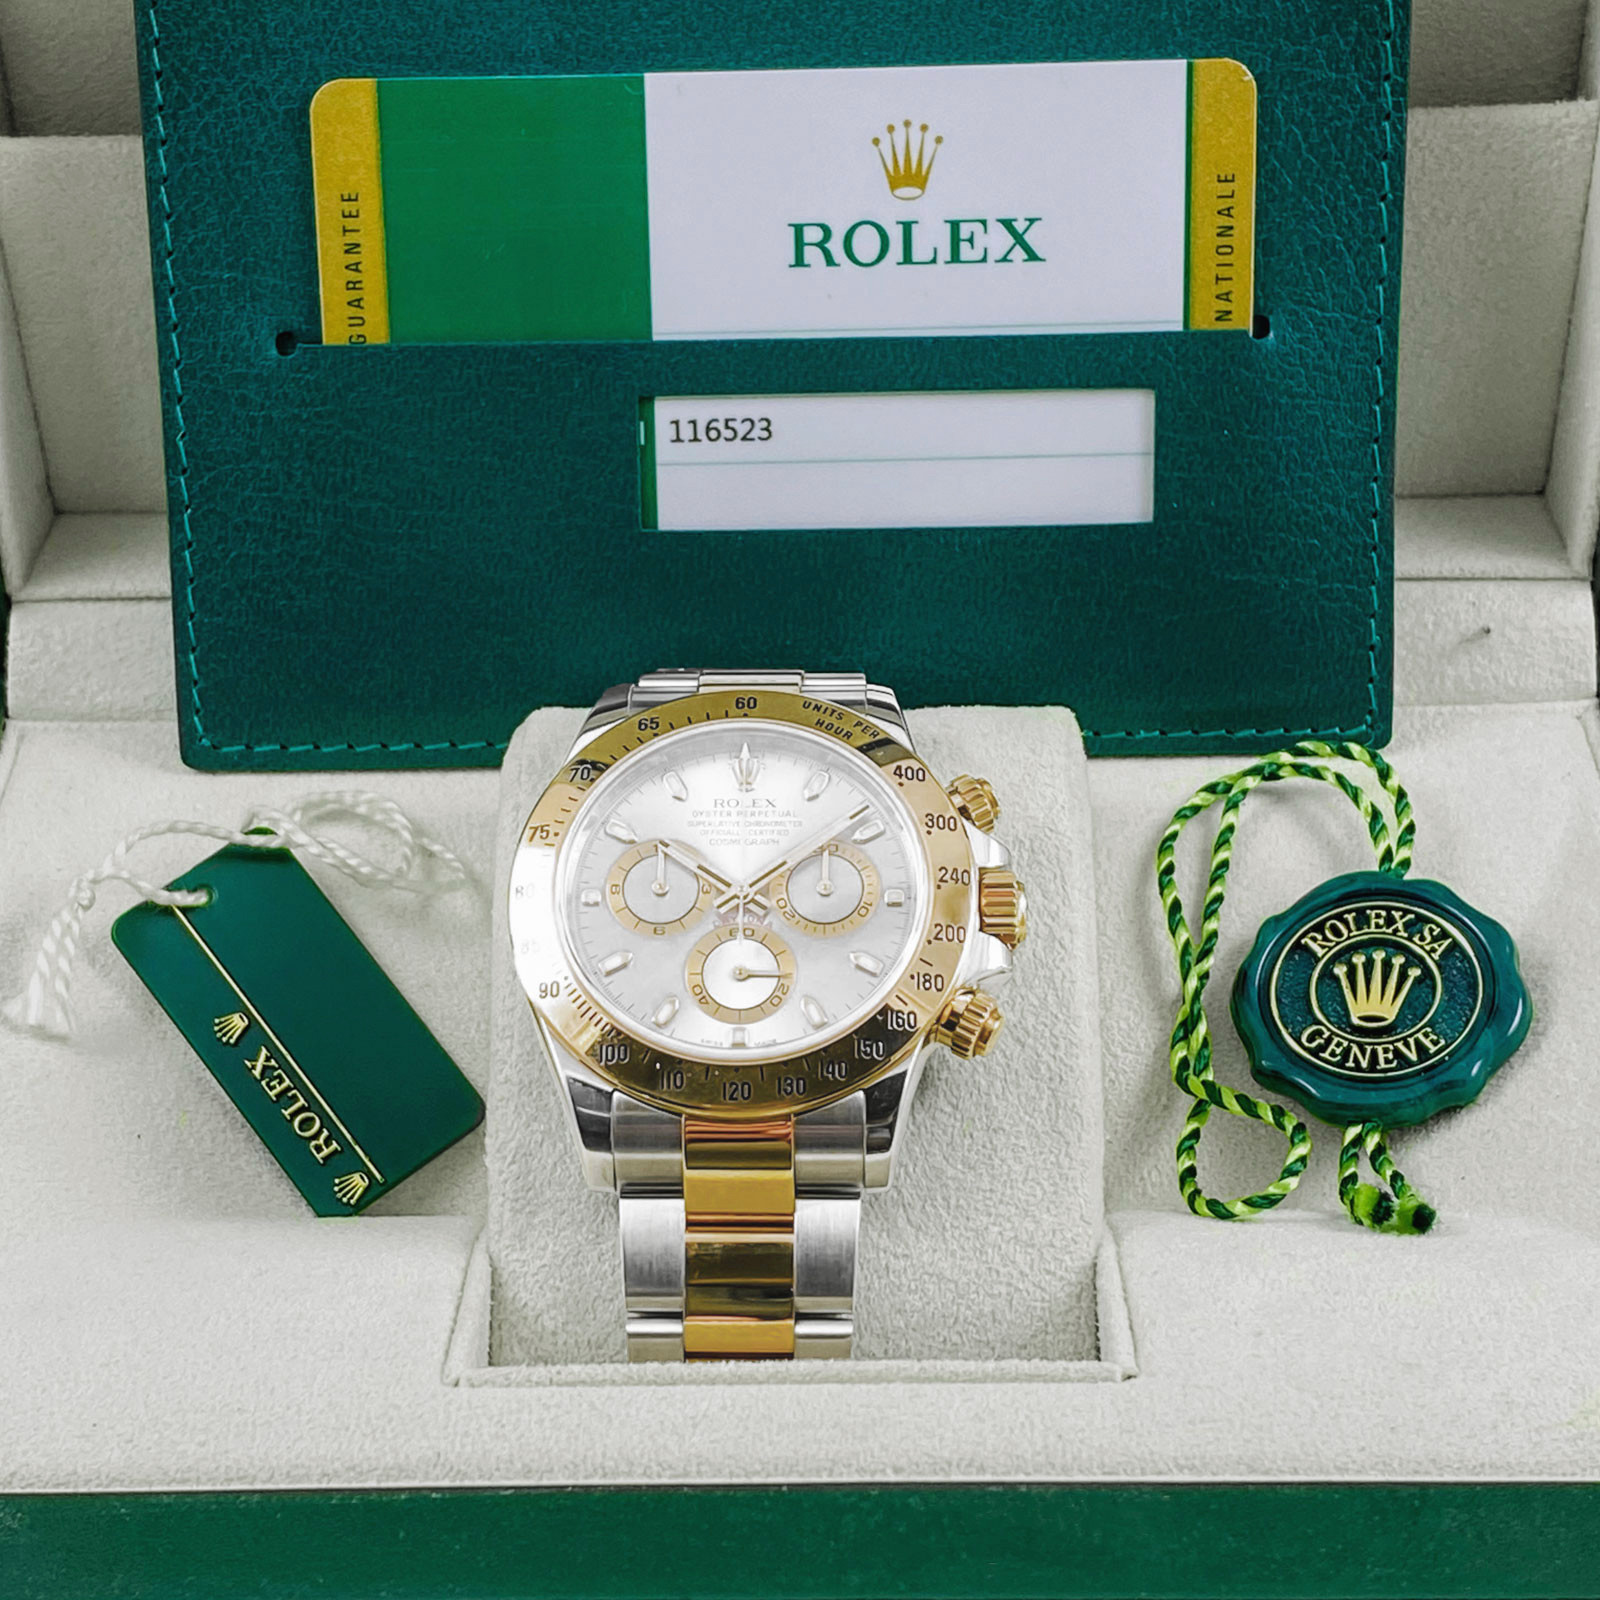 Rolex Daytona 116523 Mint Condition 2016